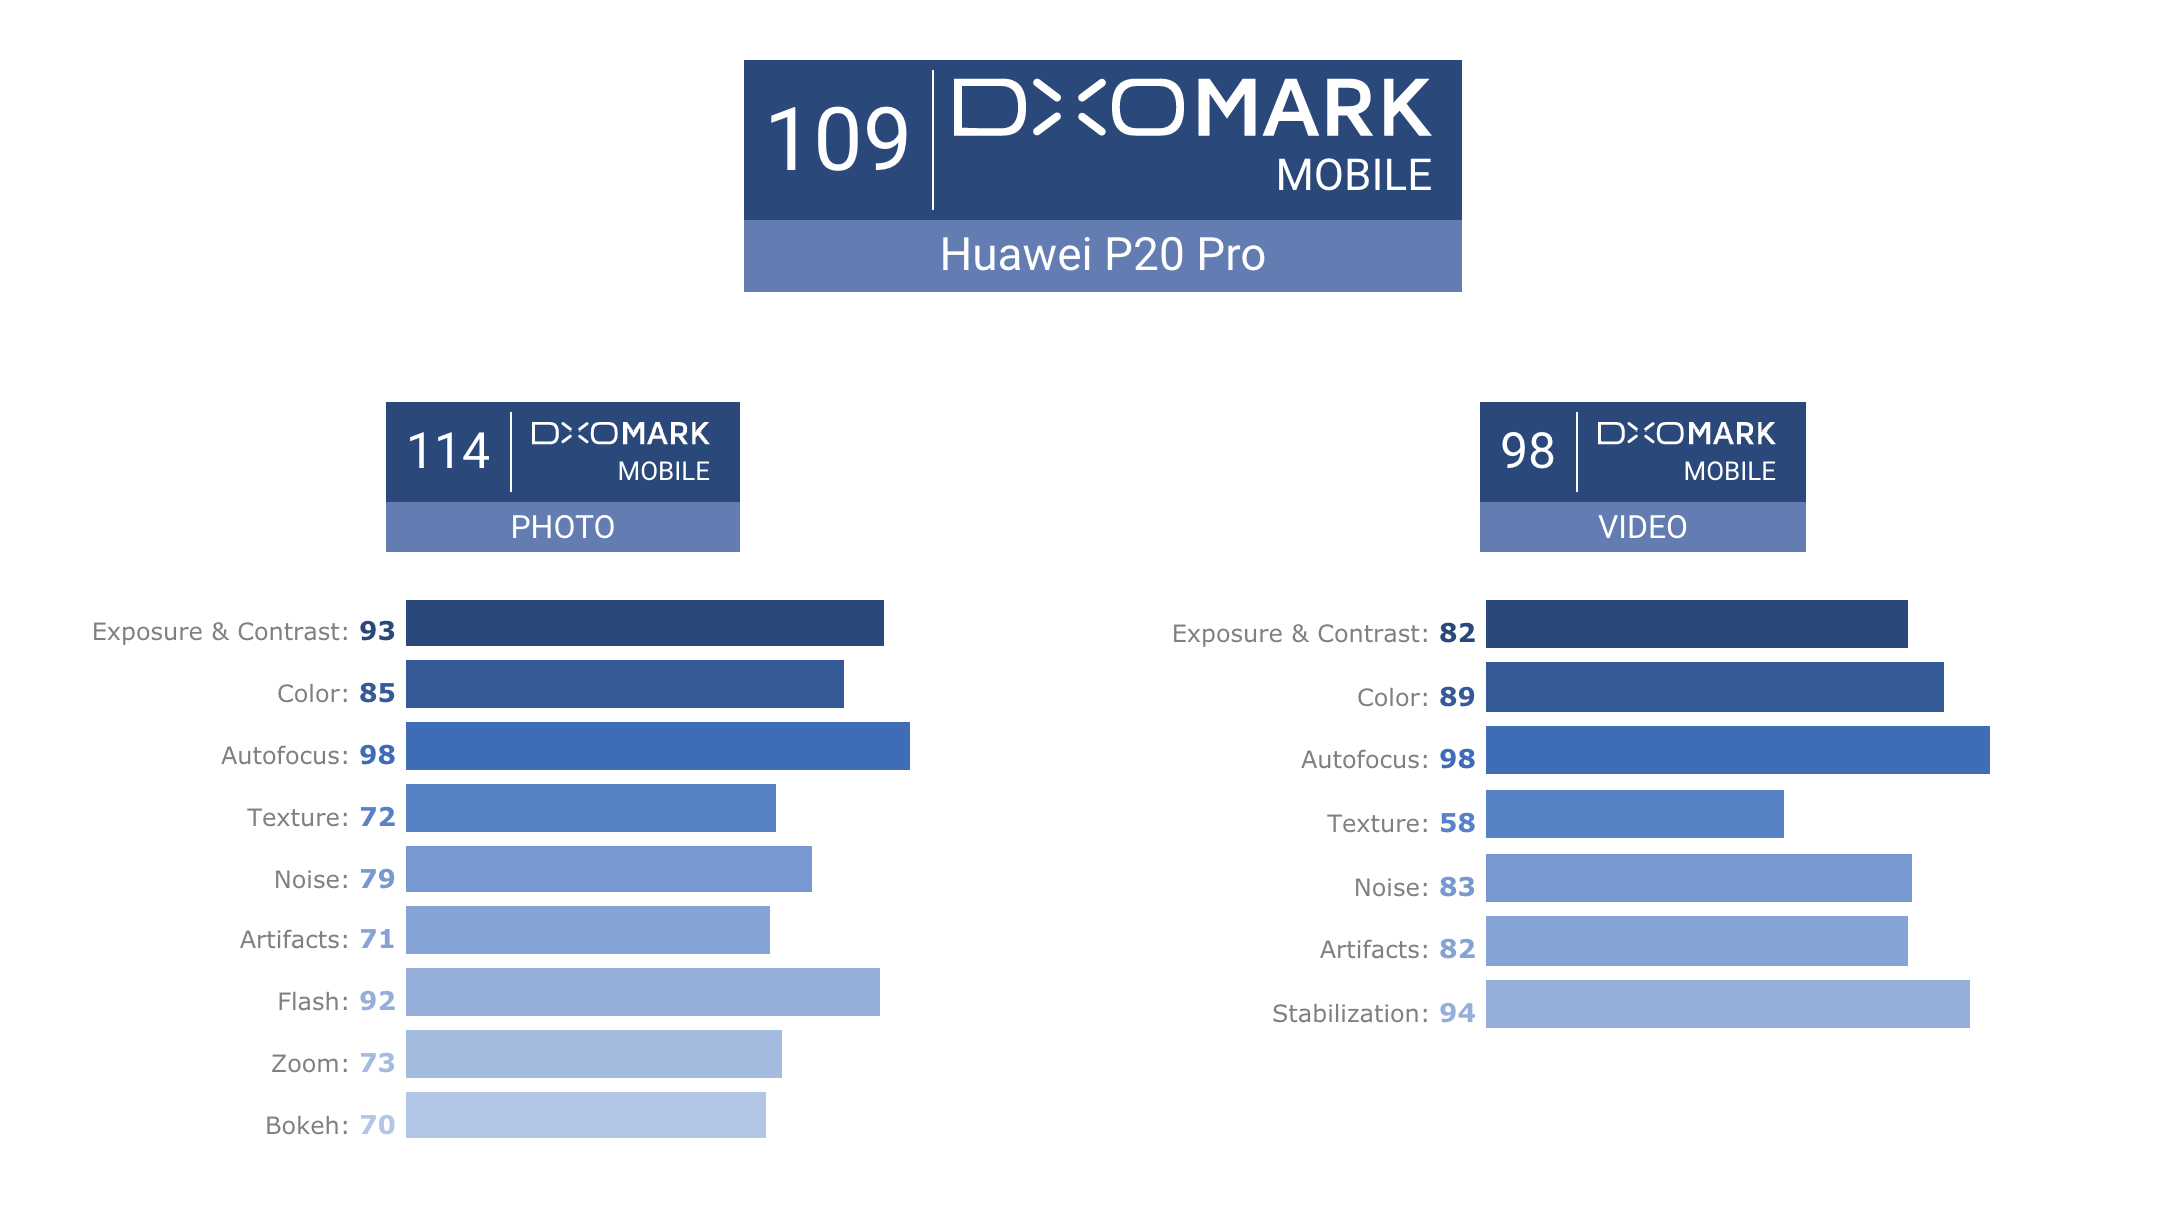 Huawei P20 Pro triple-camera receives DxOMark score of 109